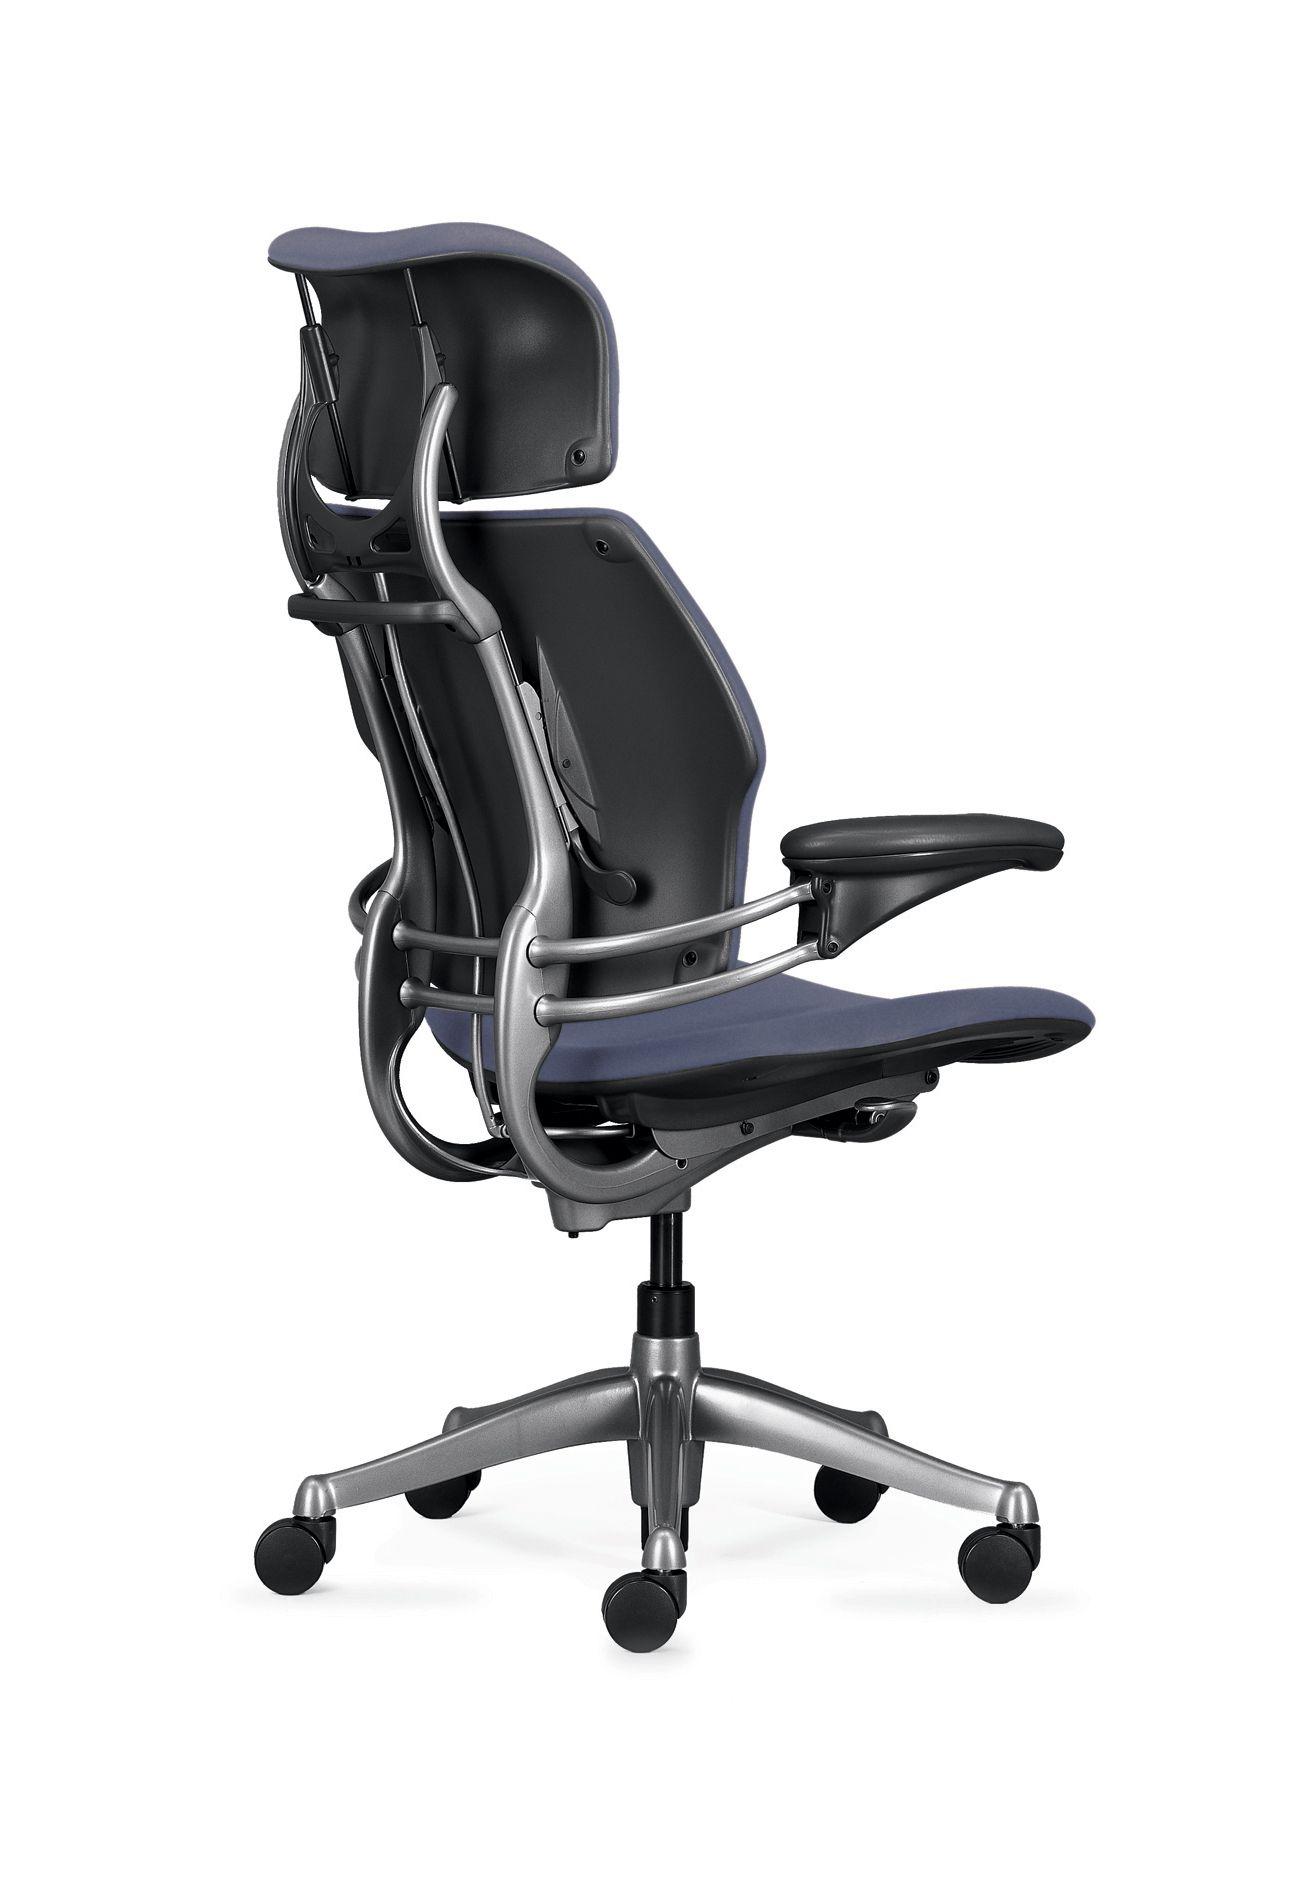 F211td51234backjpg 13001900 pixels chair ergonomic